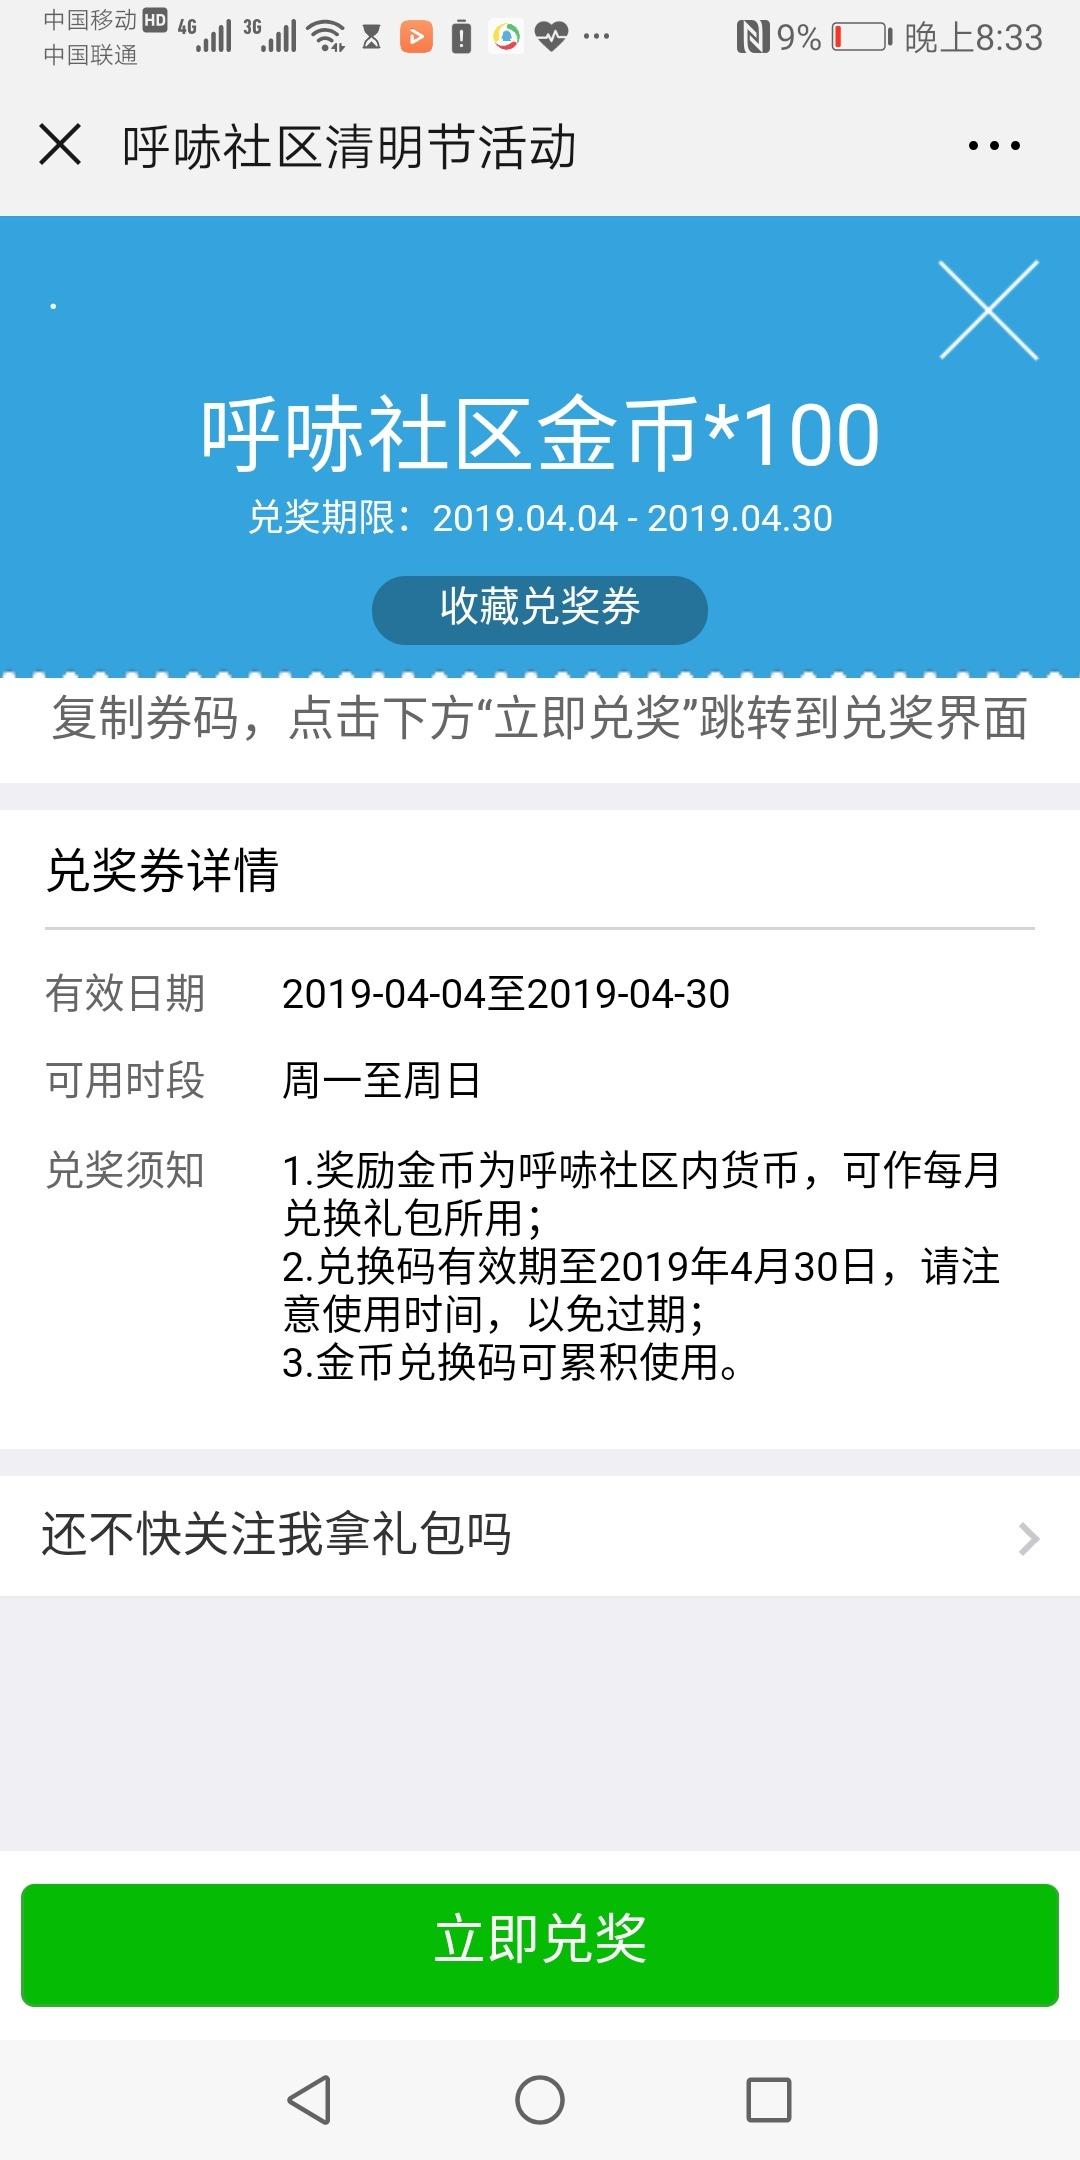 Screenshot_20190408_203343_com.tencent.mm.jpg